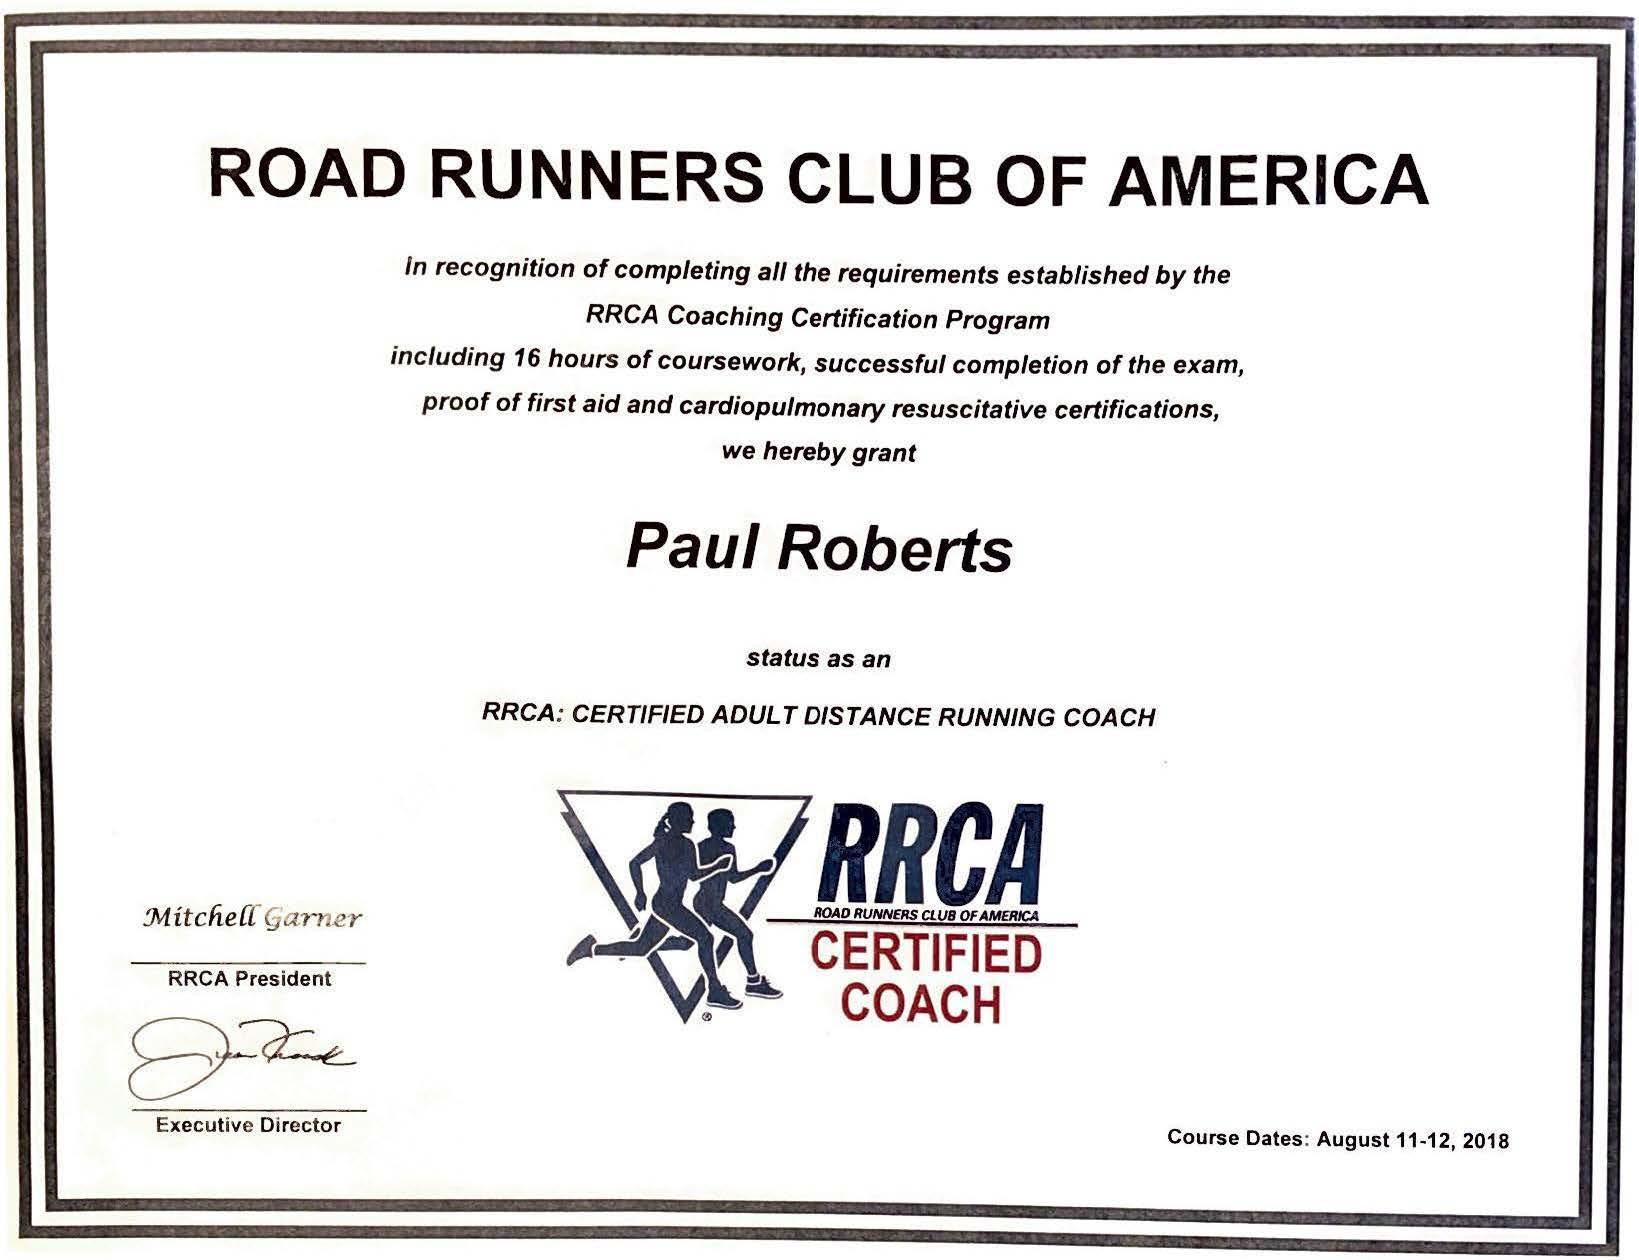 Road Runners Club of America RRCA Certified Coach Certificate